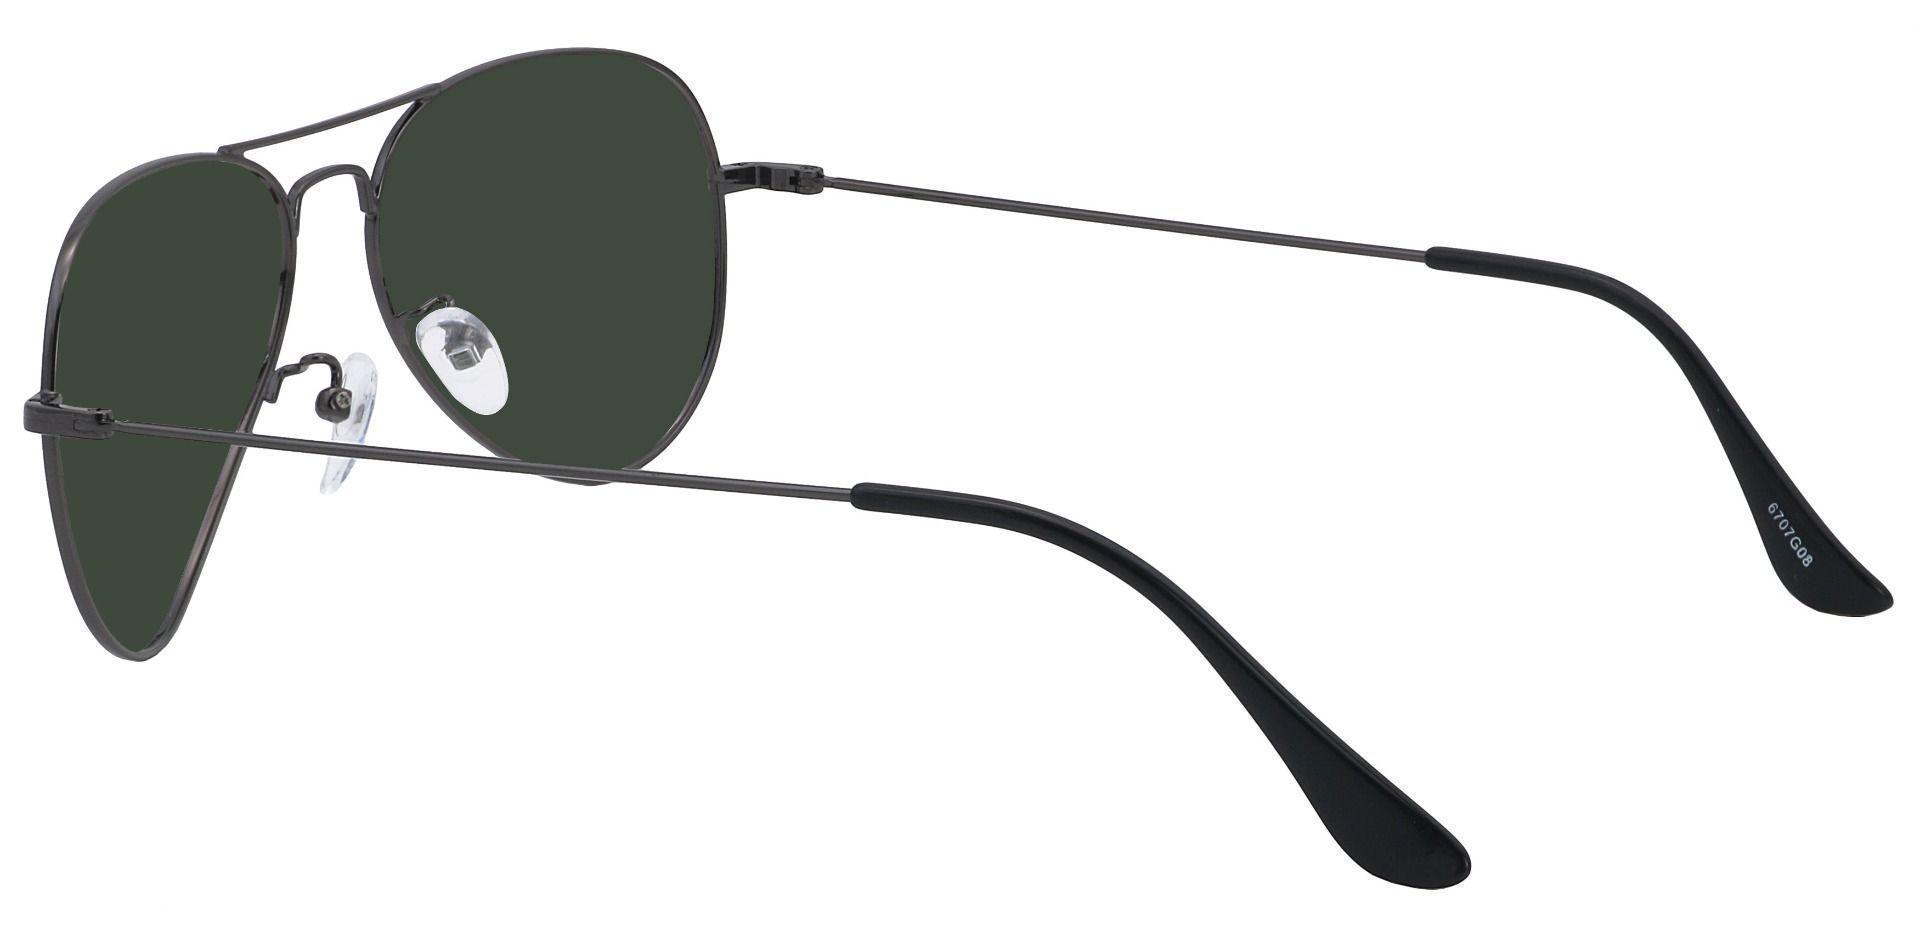 Memphis Aviator Single Vision Sunglasses - Gray Frame With Green Lenses